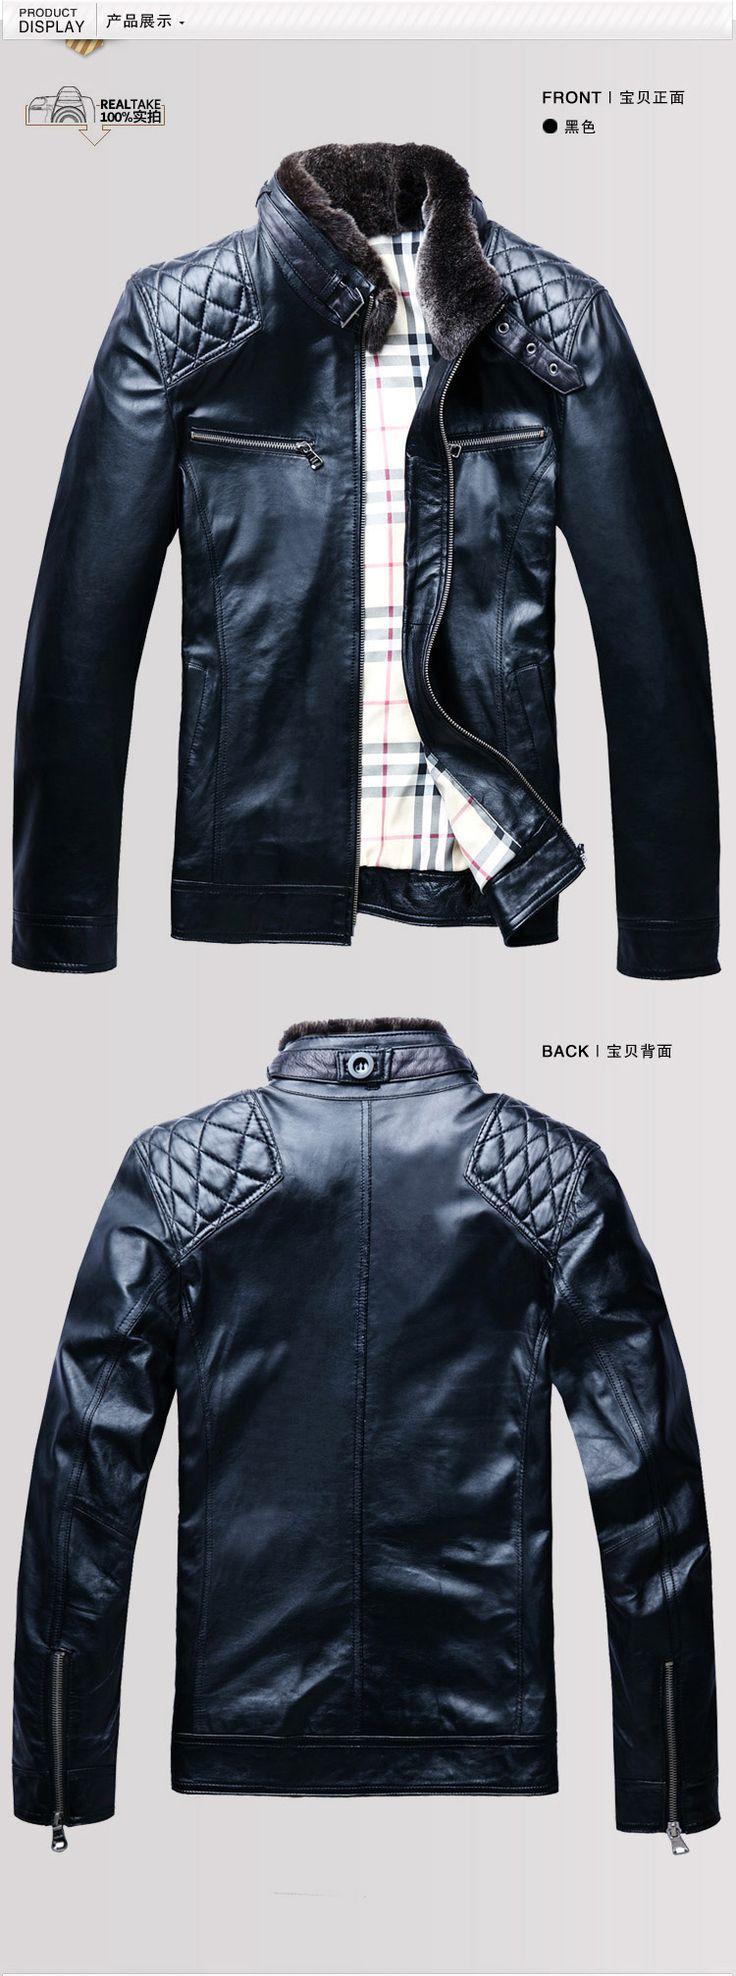 Men's genuine sheepskin leather & suede jacket rabbit fur collar zipper front fly black short atutumn spring motorcycle coat 4XL-inLeather &...